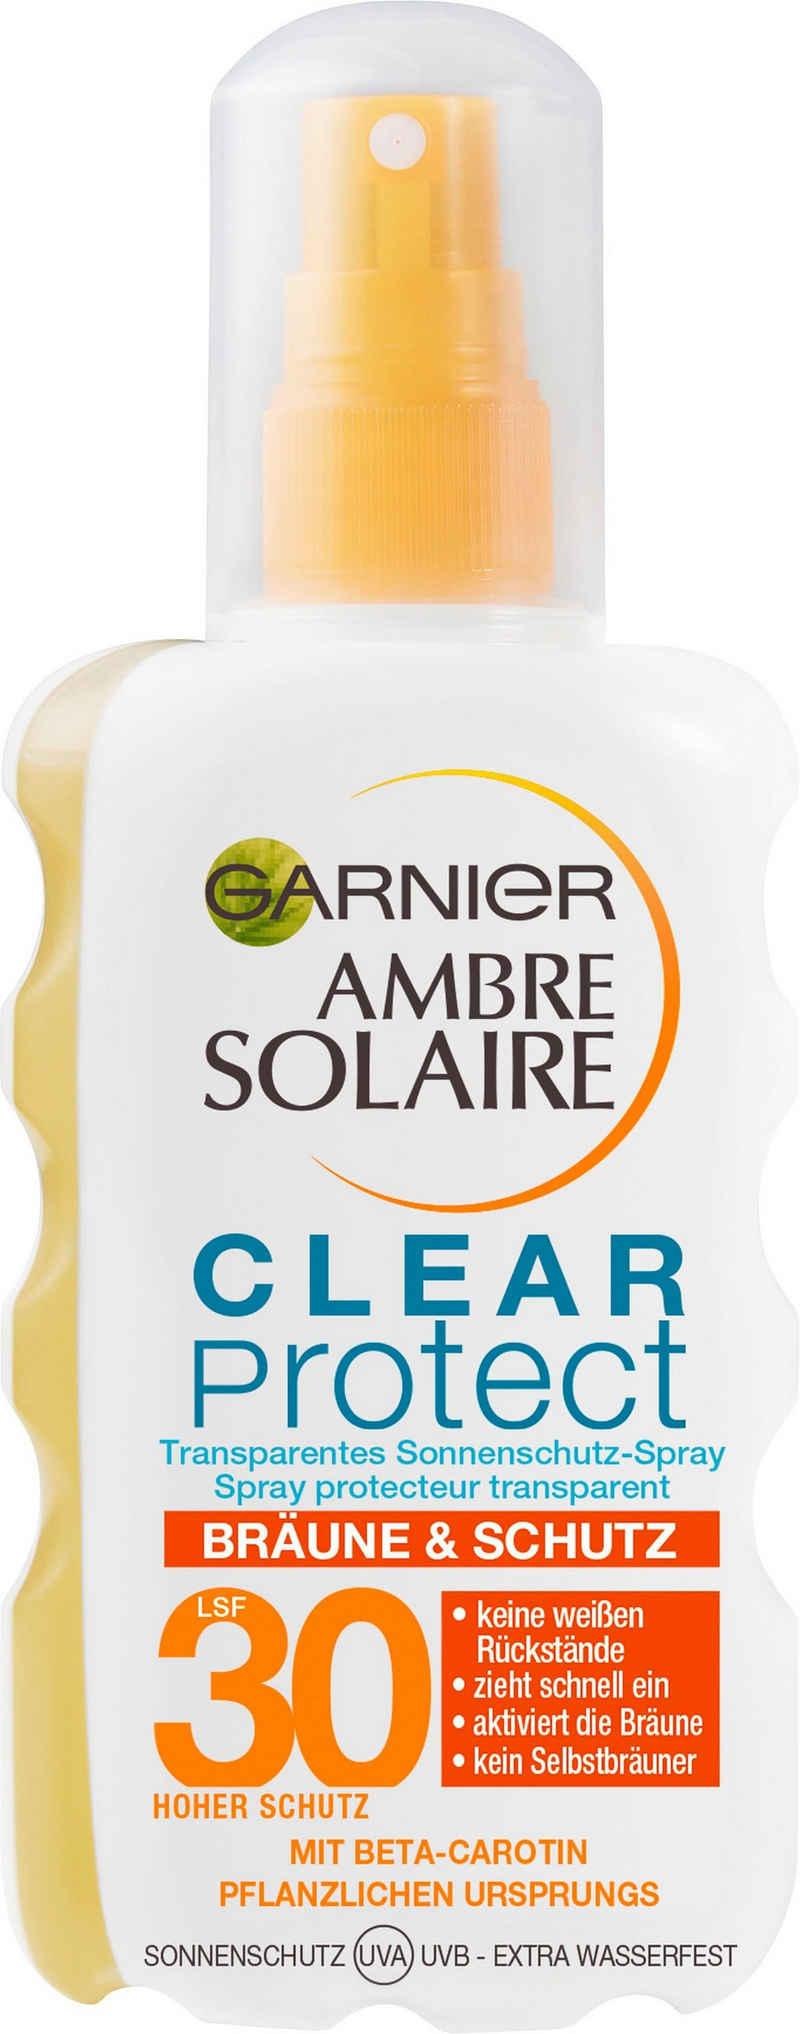 GARNIER Sonnenschutzspray »Clear Protect Bräune & Schutz«, transparentes Sonnenschutz-Spray LSF 30